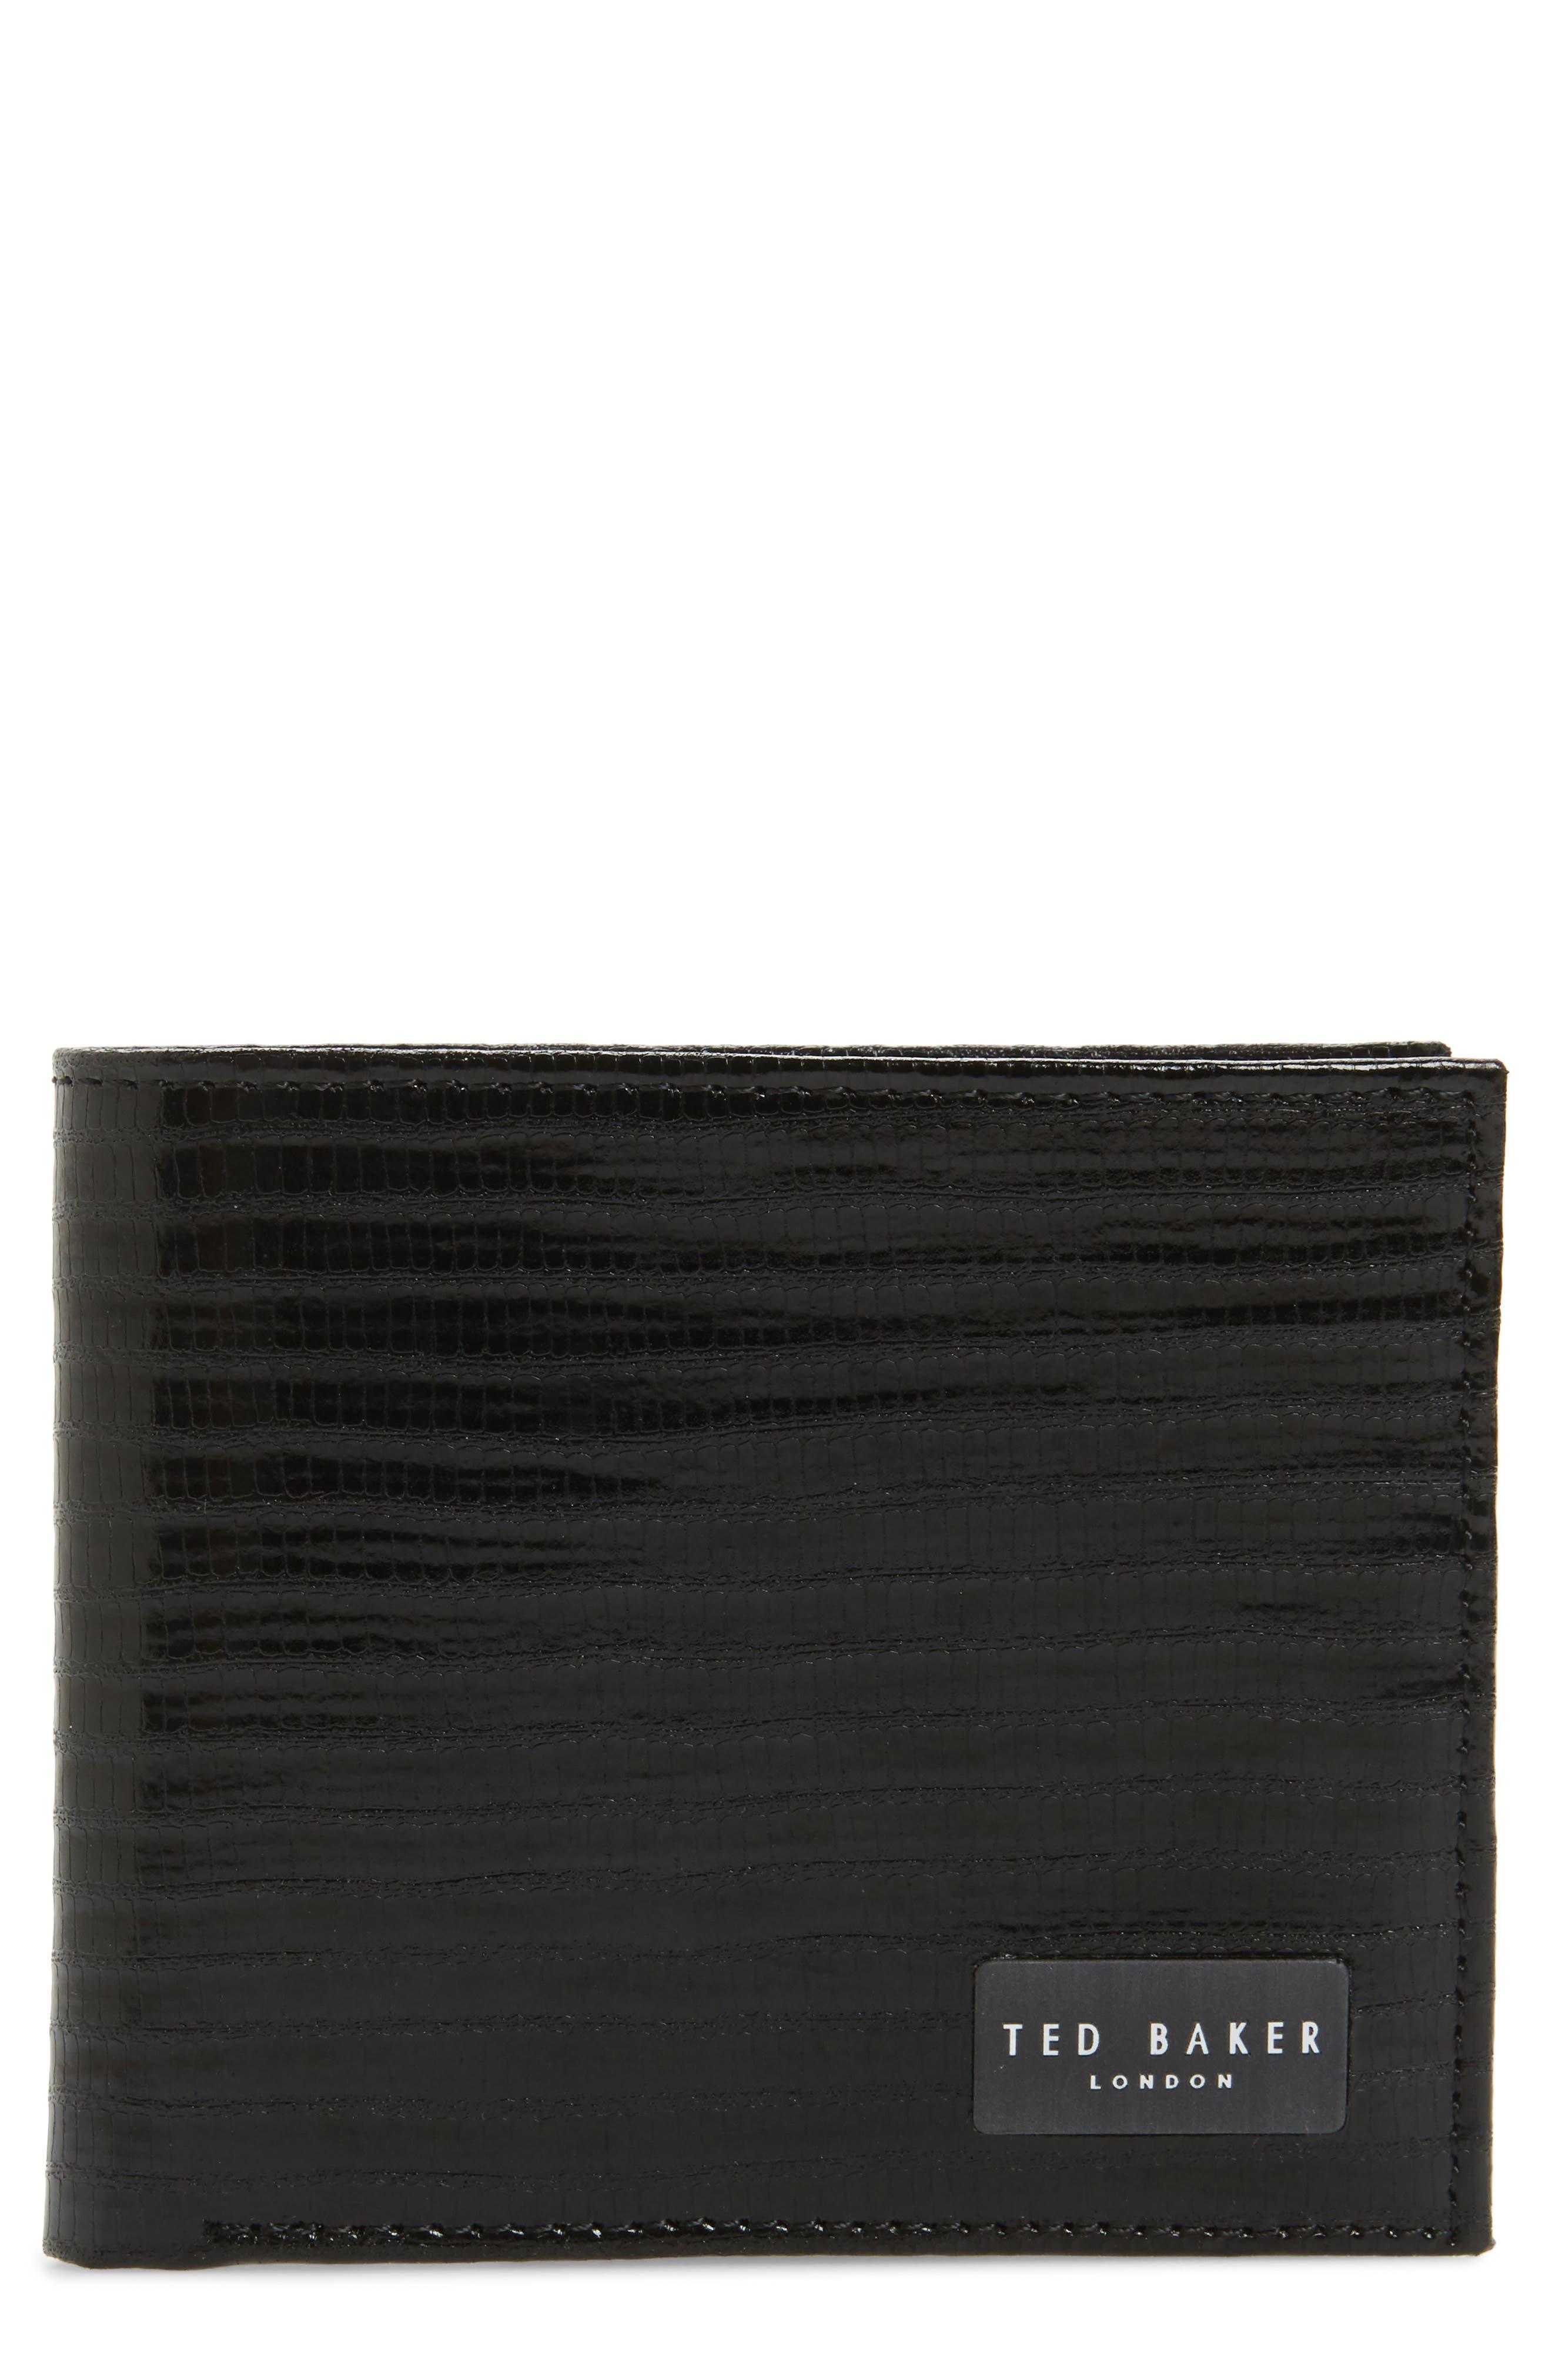 Main Image - Ted Baker London Slayts Leather Wallet